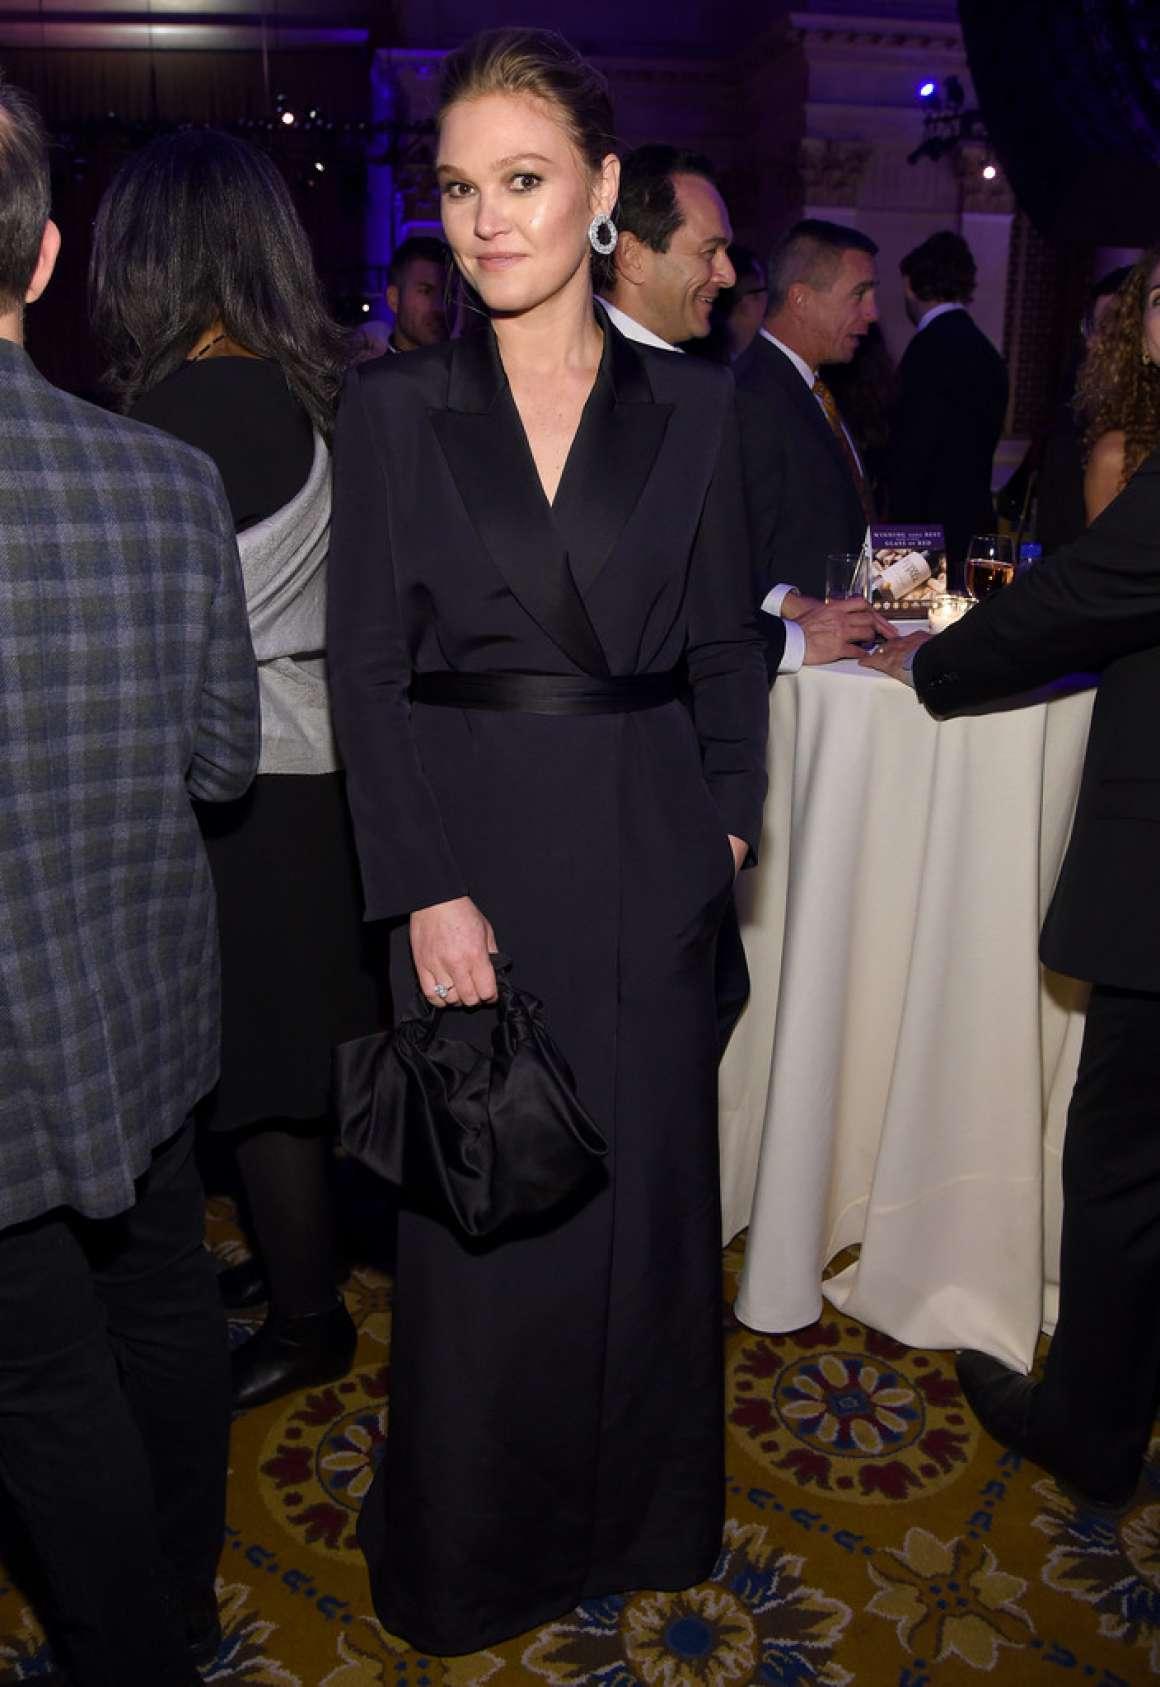 Julia Stiles 2019 : Julia Stiles – 2019 IFP Gotham Awards in NYC-06